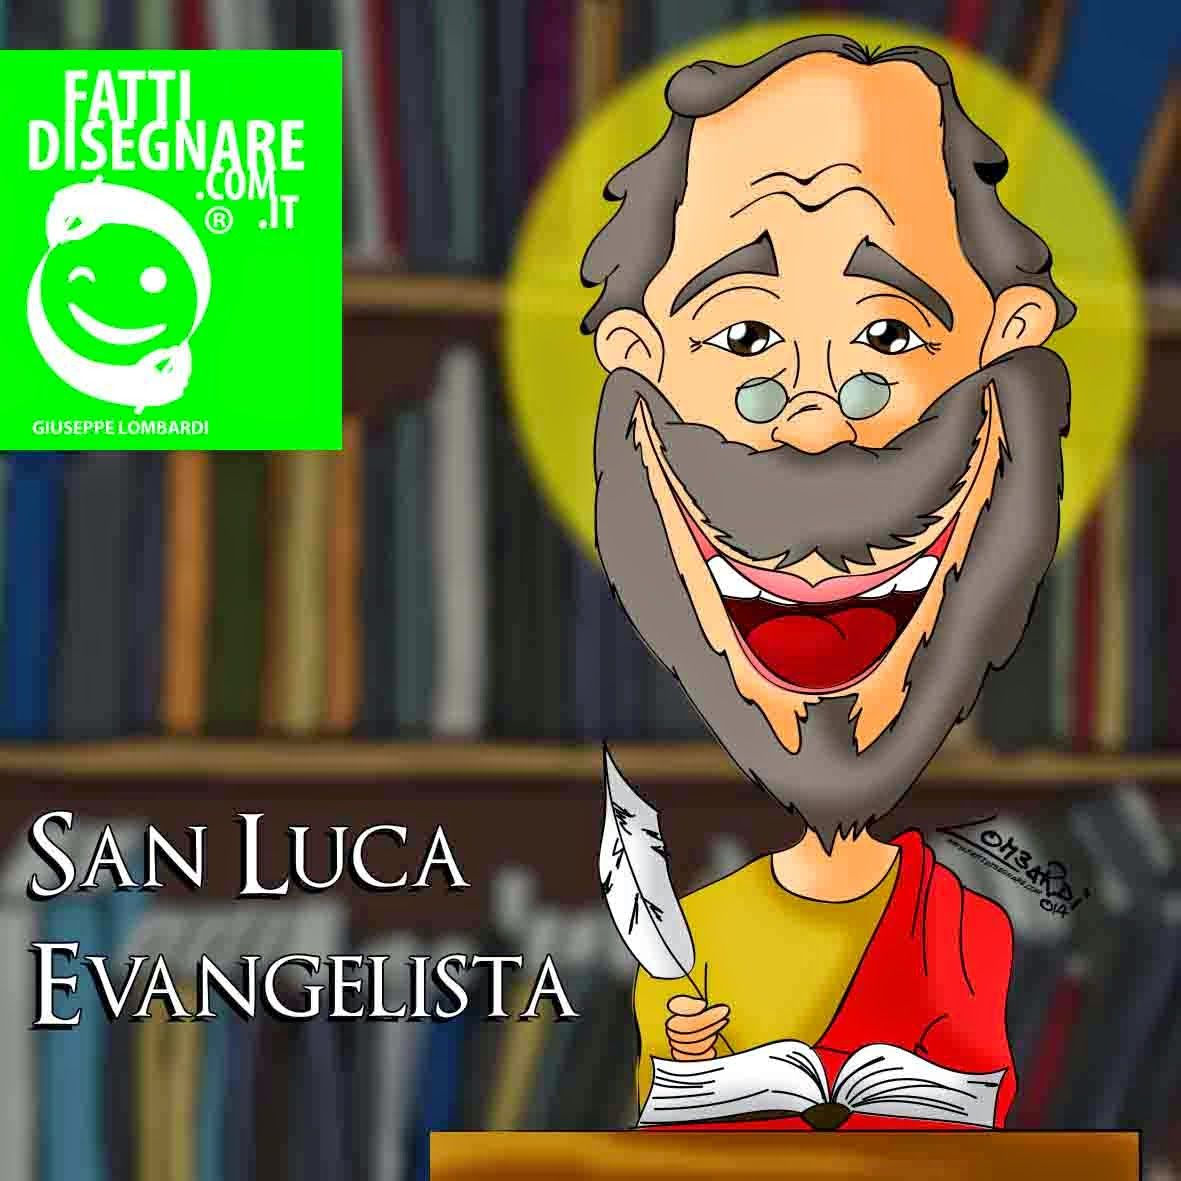 Il Santodelgiorno Sanluca Lucaevangelista Evangelista Vangelo